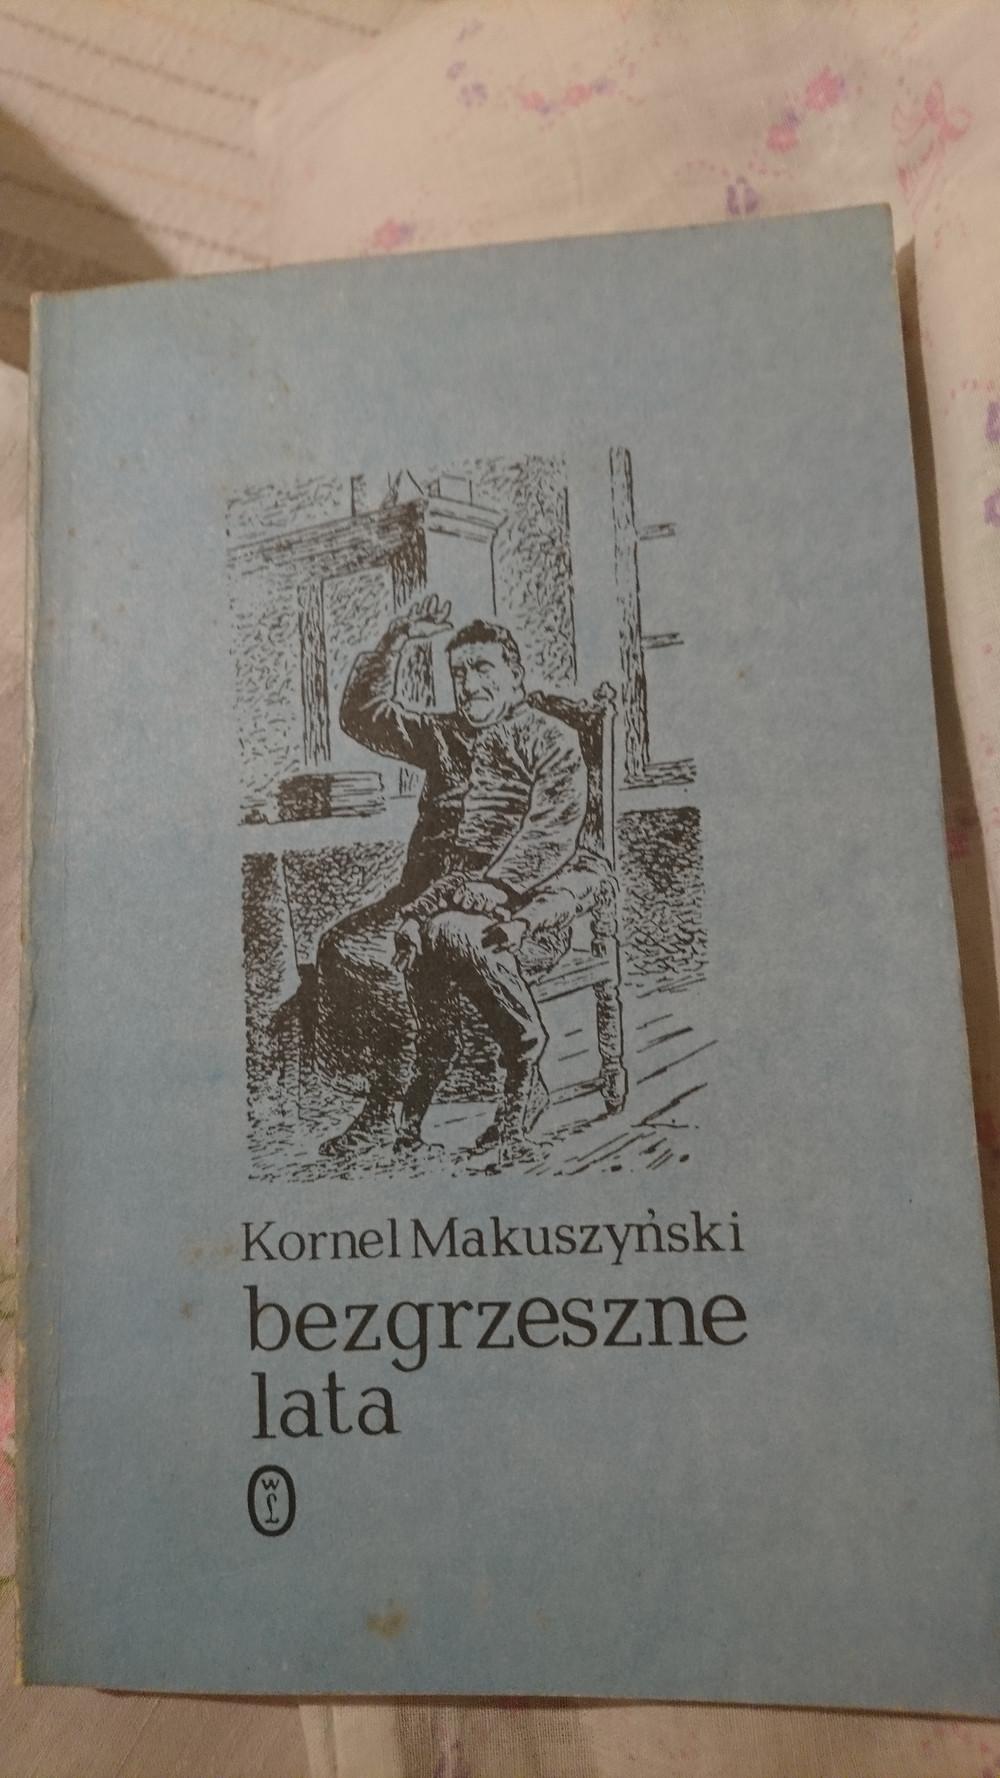 Kornel Makuszyński